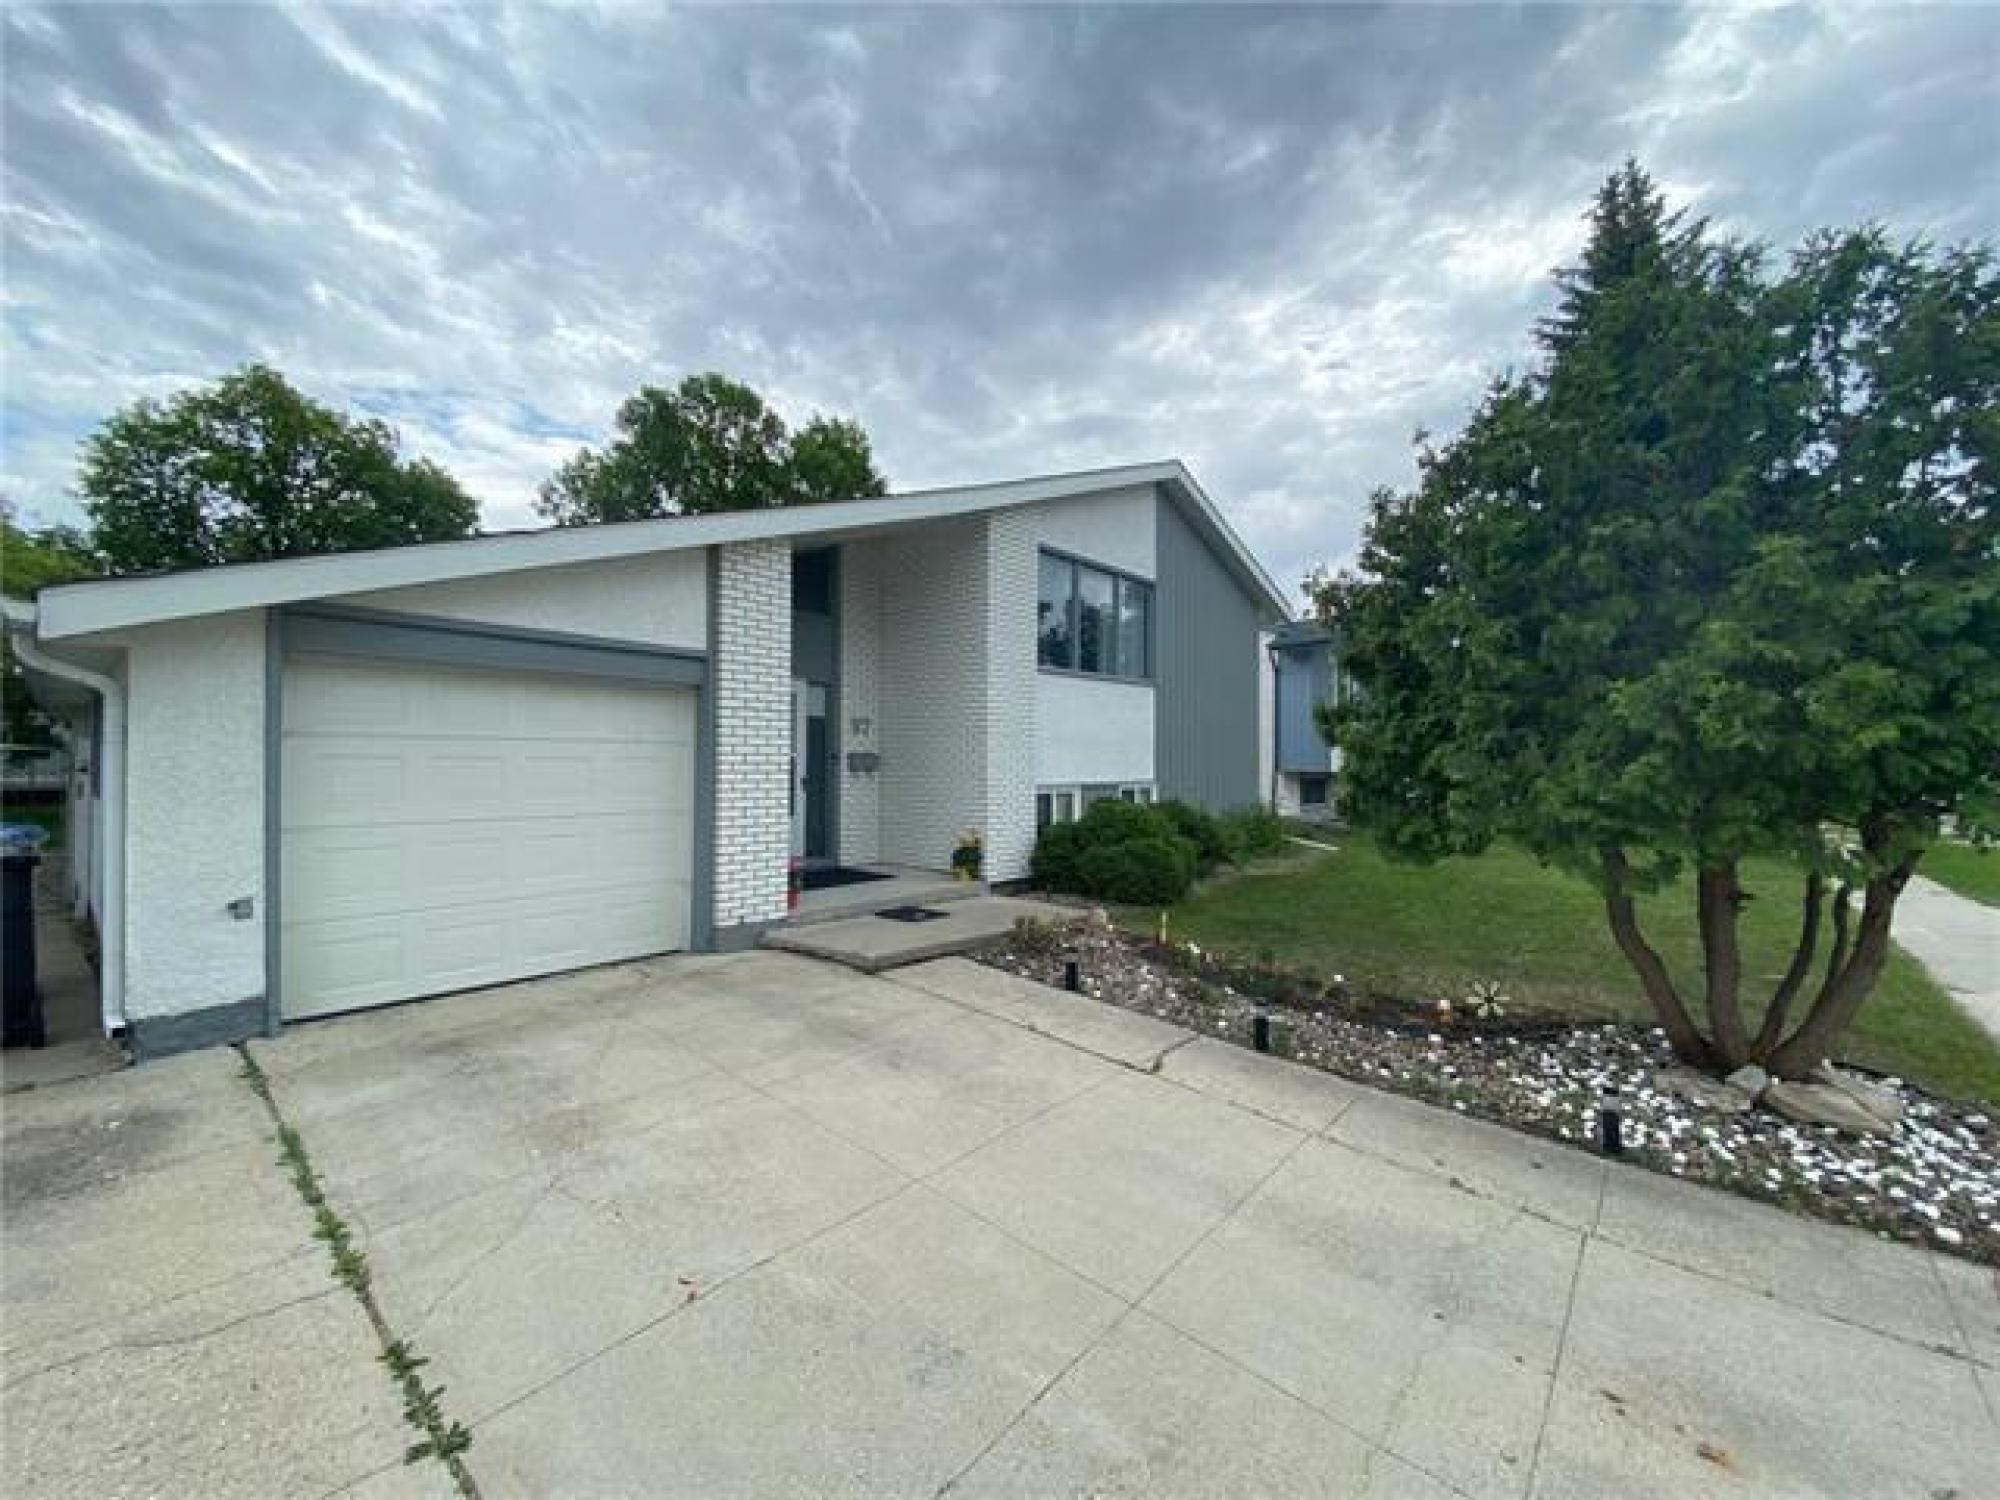 97 Cullen Drive R3r 1p3 4 Bedroom Bi Level For Sale South West Winnipeg Westdale Winnipeg Free Press Homes